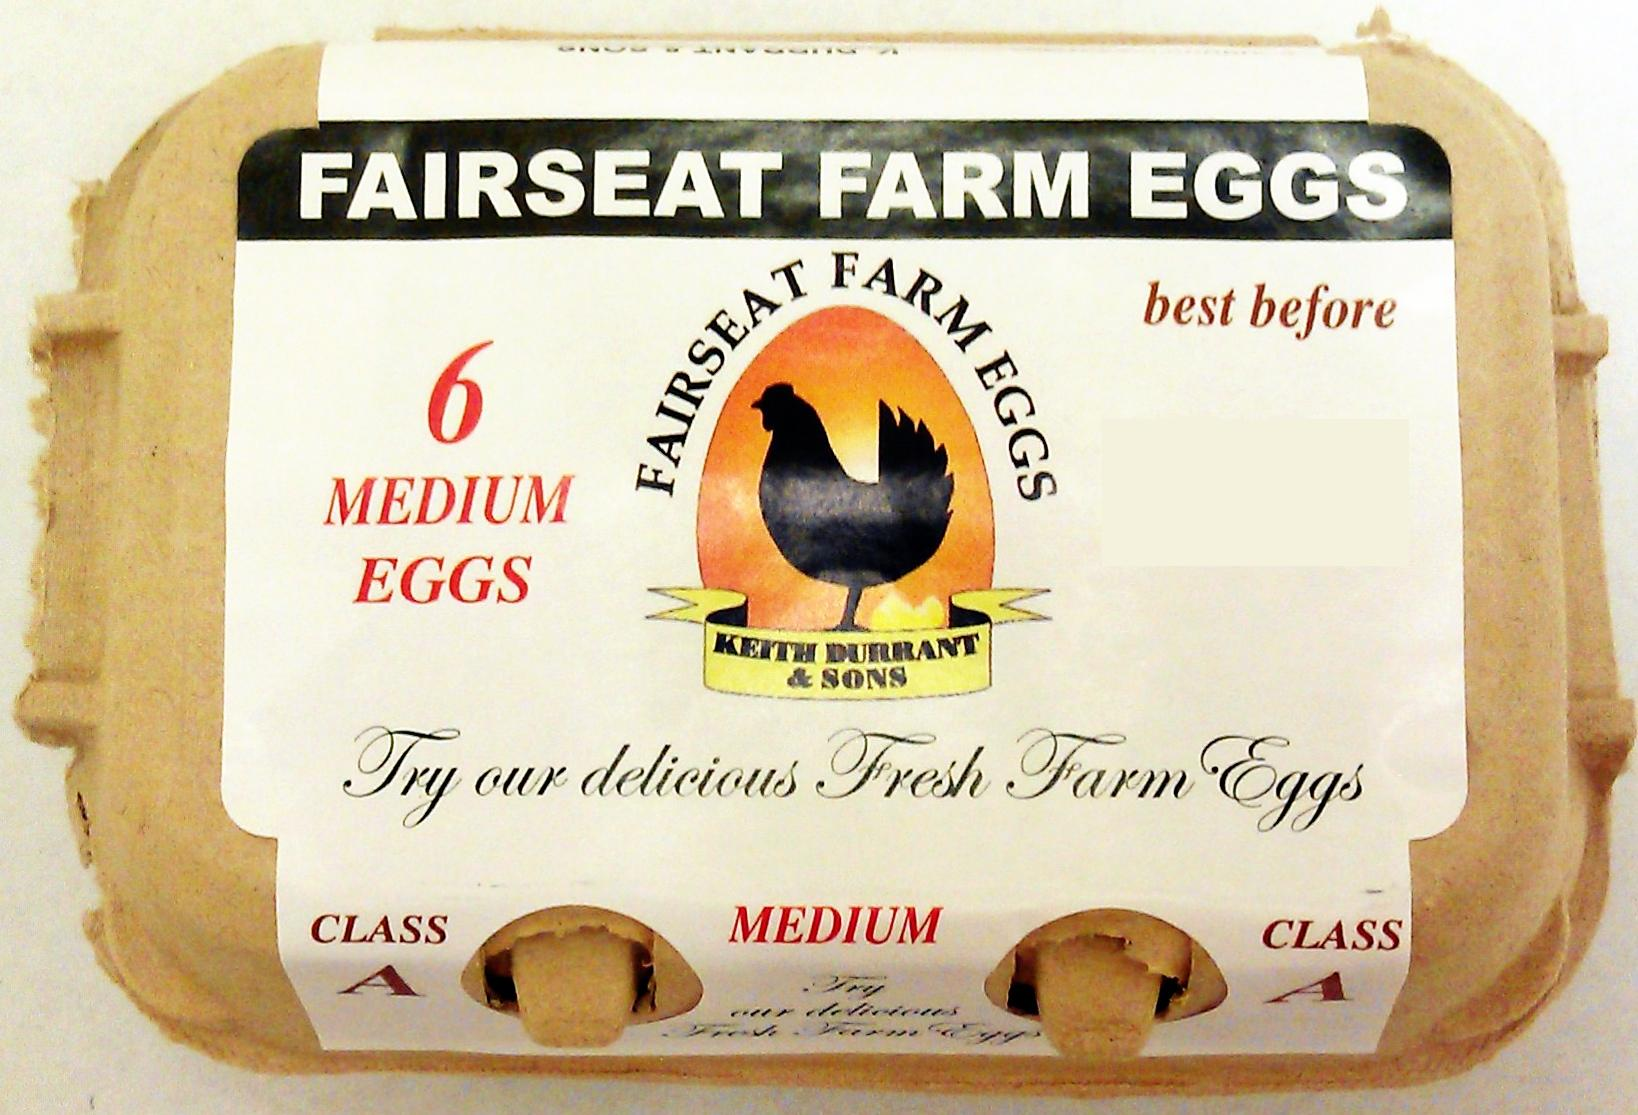 Six Medium Eggs.